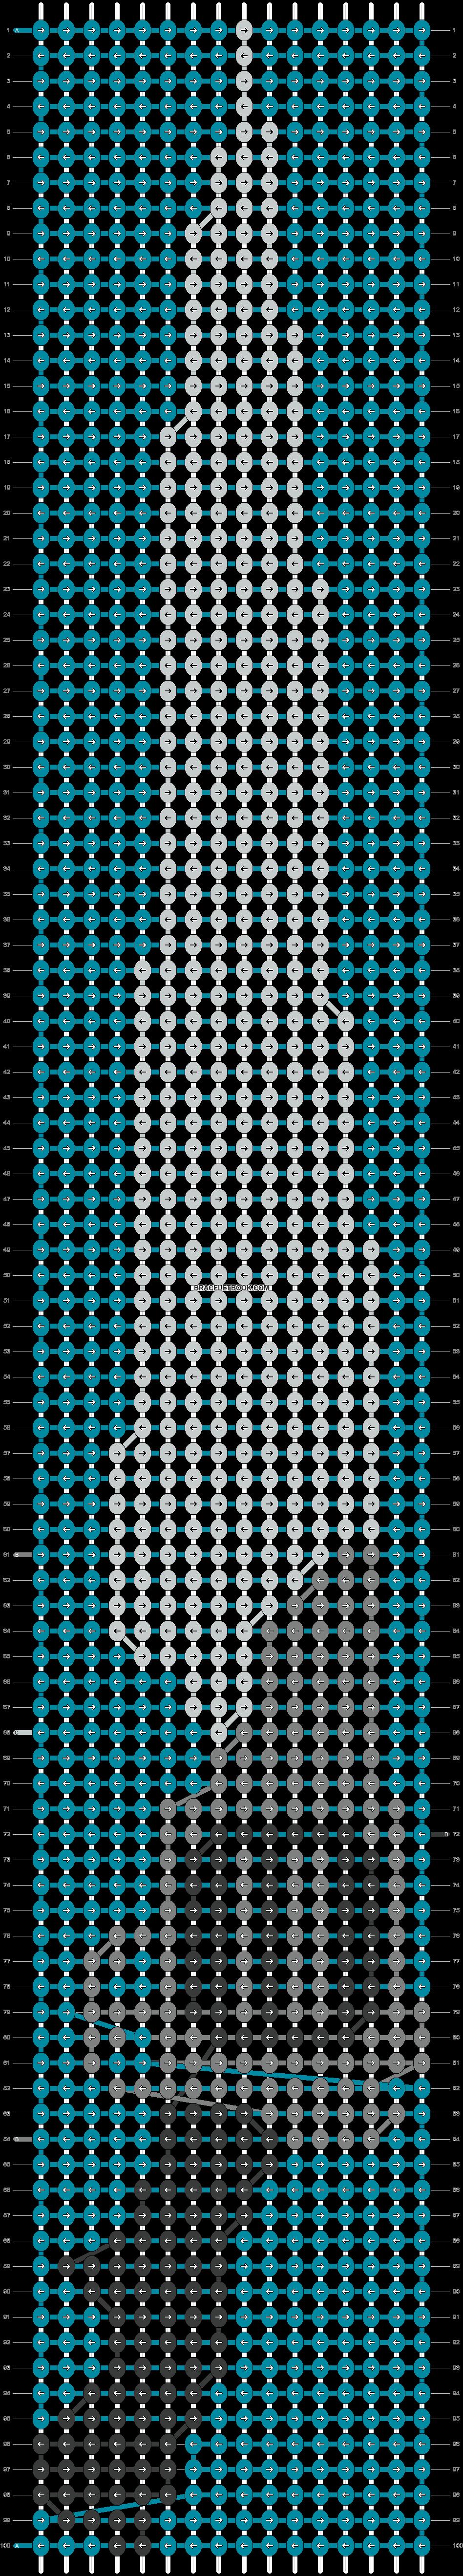 Alpha pattern #14380 pattern